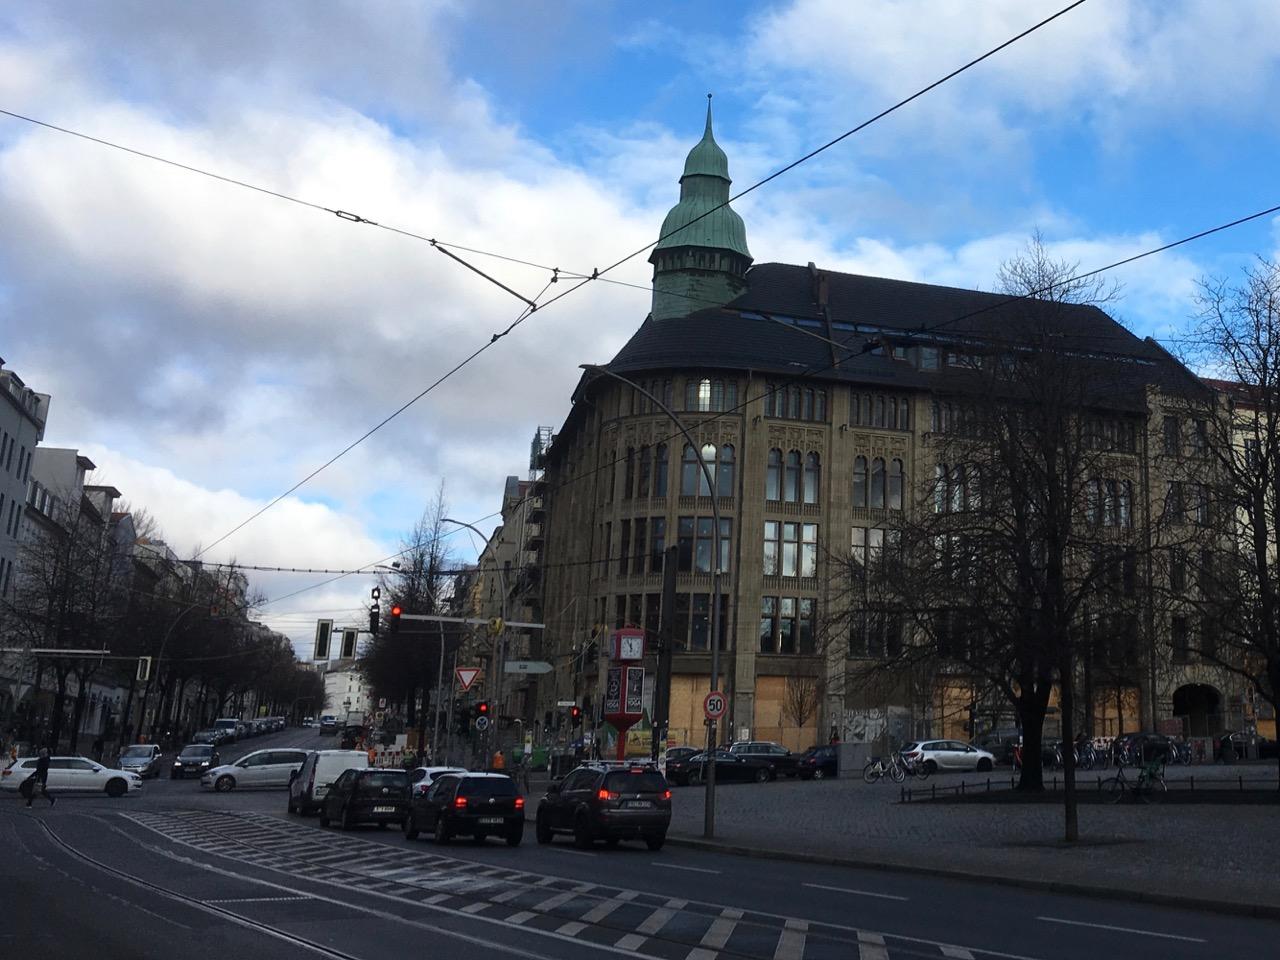 Kaufhaus Jandorf / ヤンドルフ百貨店の行方